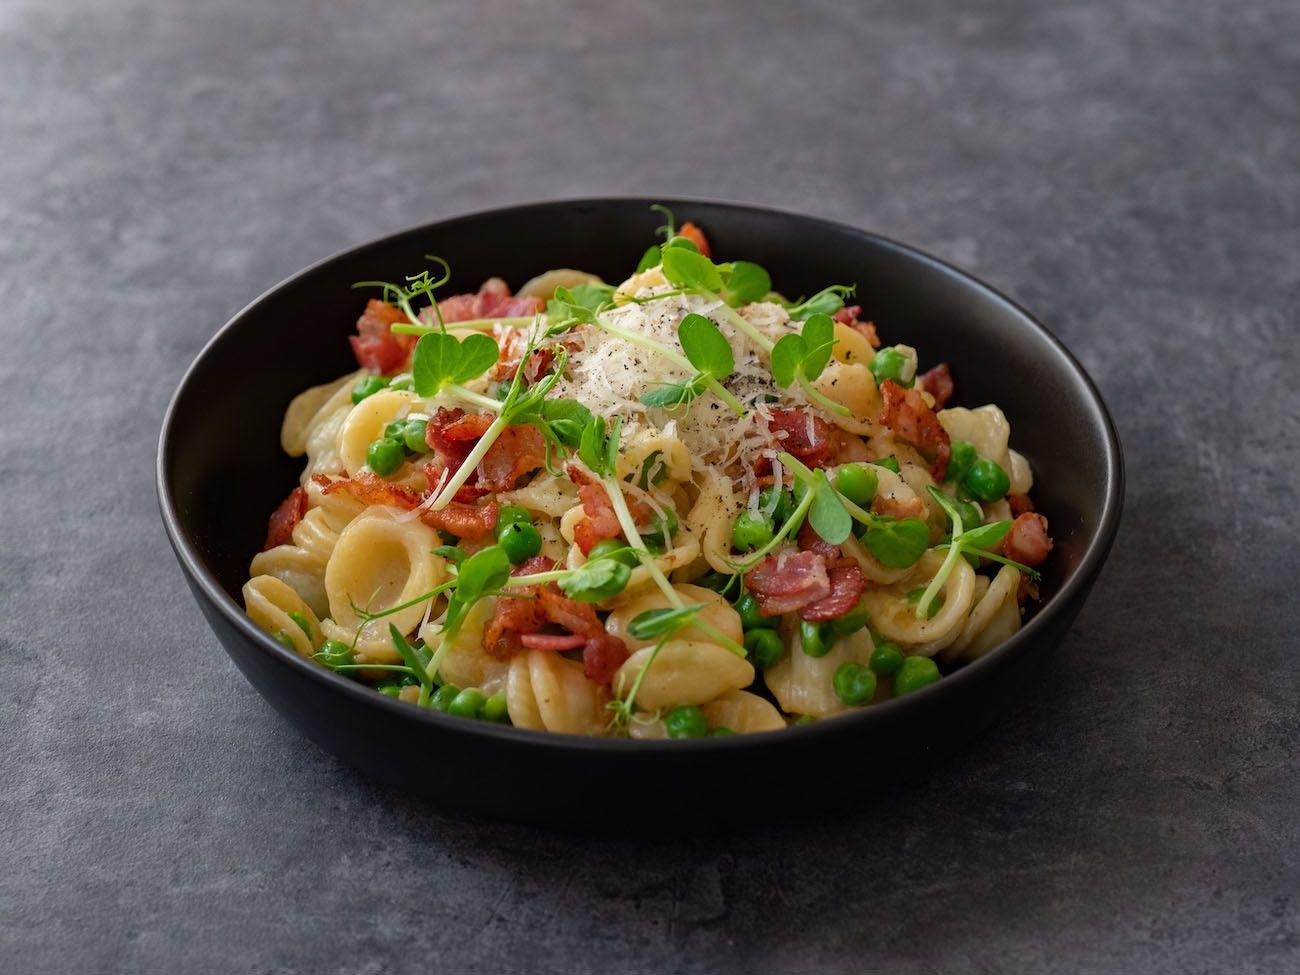 About Fuel, Foodblog, Rezept, Orecchiette mit Erbsen und Speck, Pasta, Parmesan